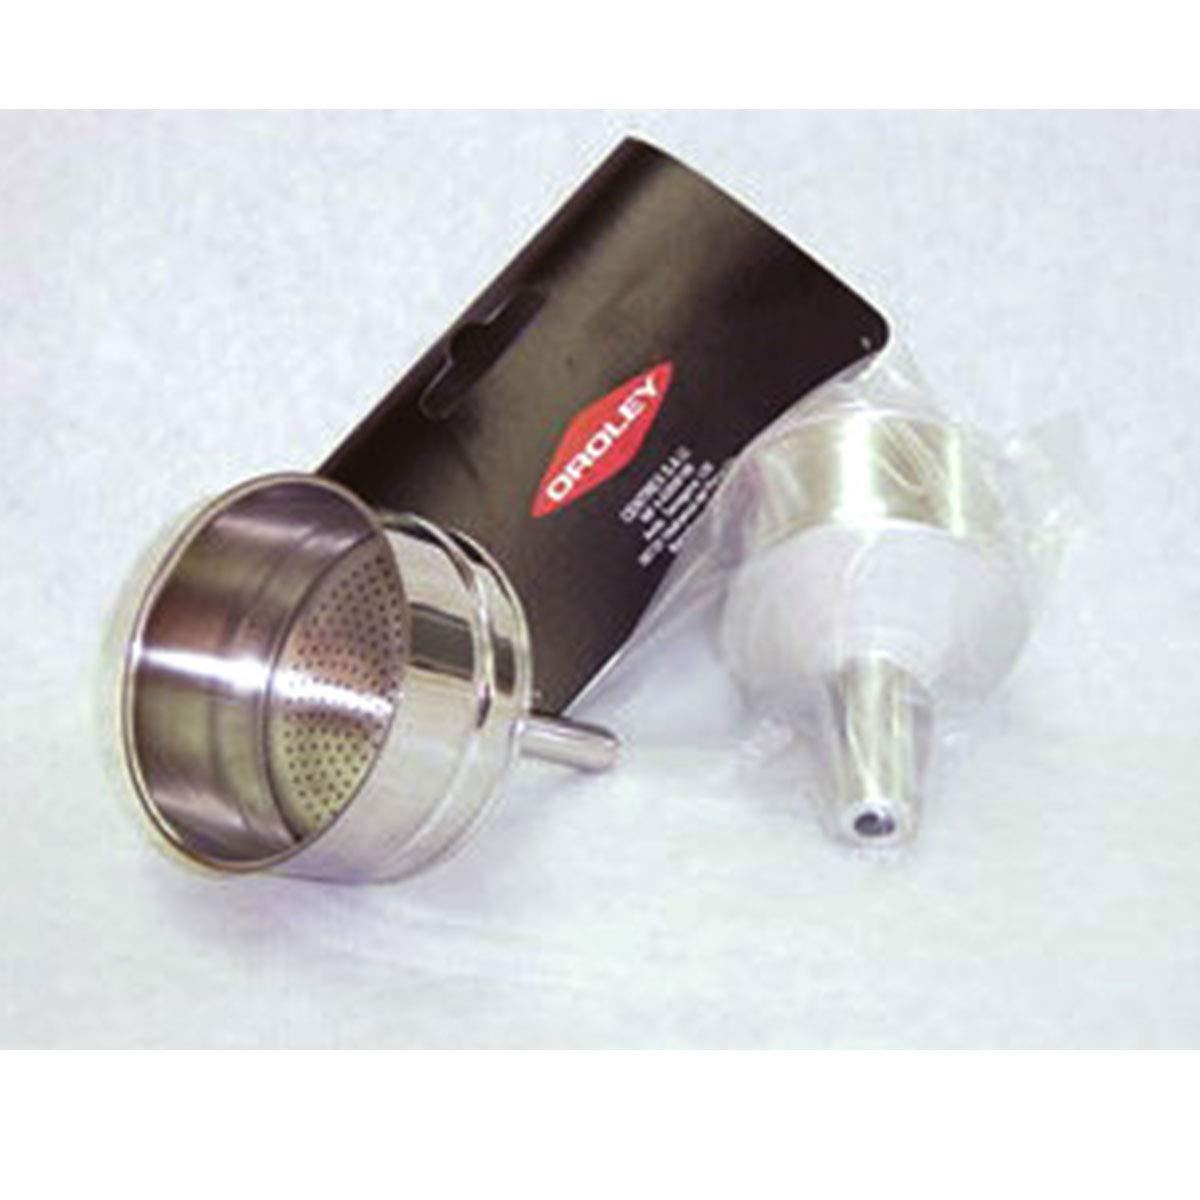 Plateado 21x20x14 cm ORYX Embudo Cafetera Inducci/ón 2 Tazas Aluminio